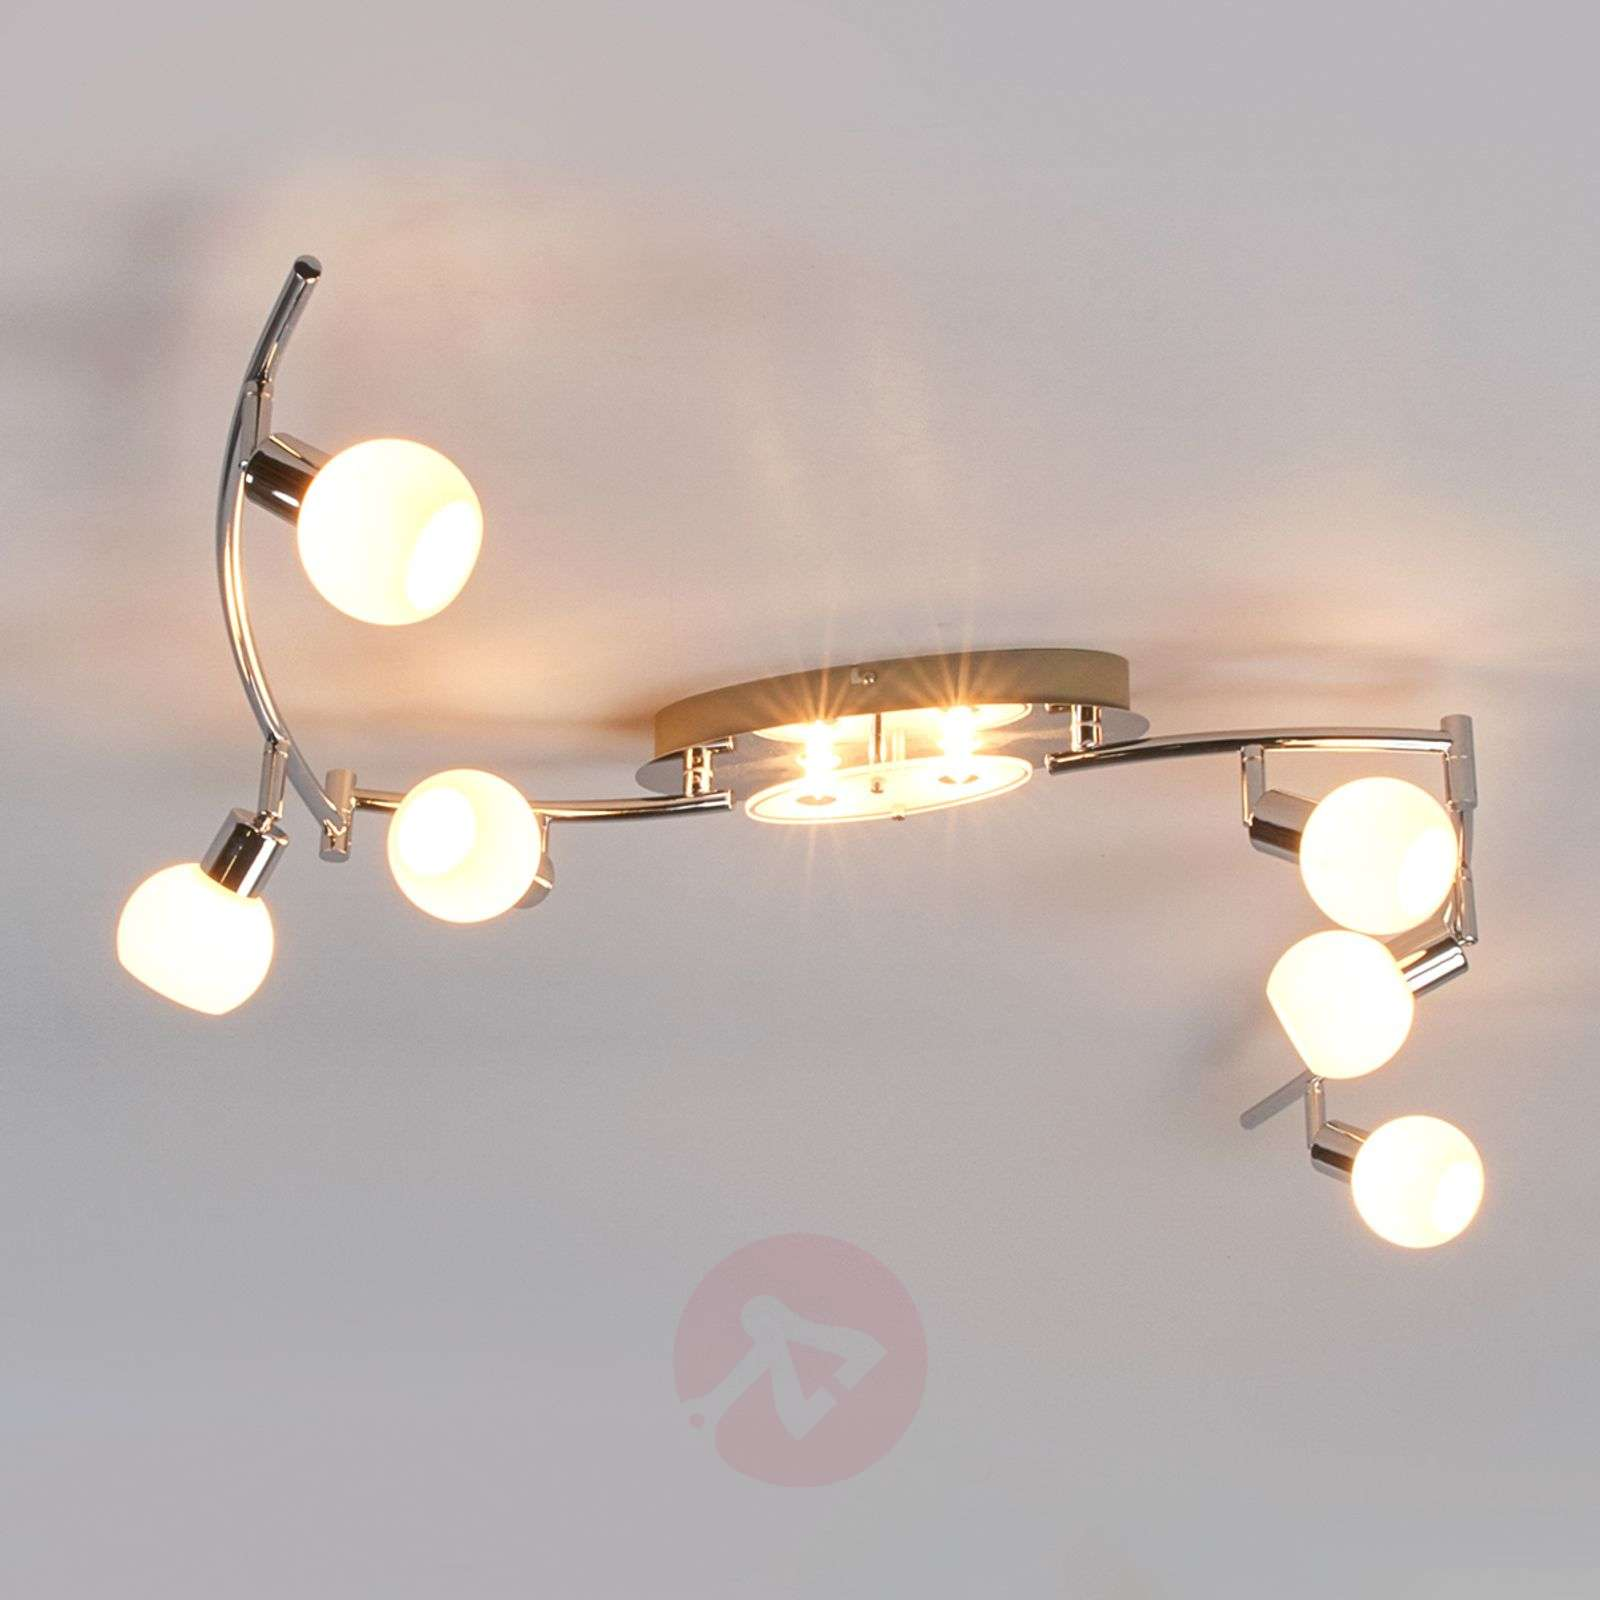 8 bulb led ceiling light evaletta g9 lamps lights 8 bulb led ceiling light evaletta g9 lamps 9994093 02 aloadofball Choice Image